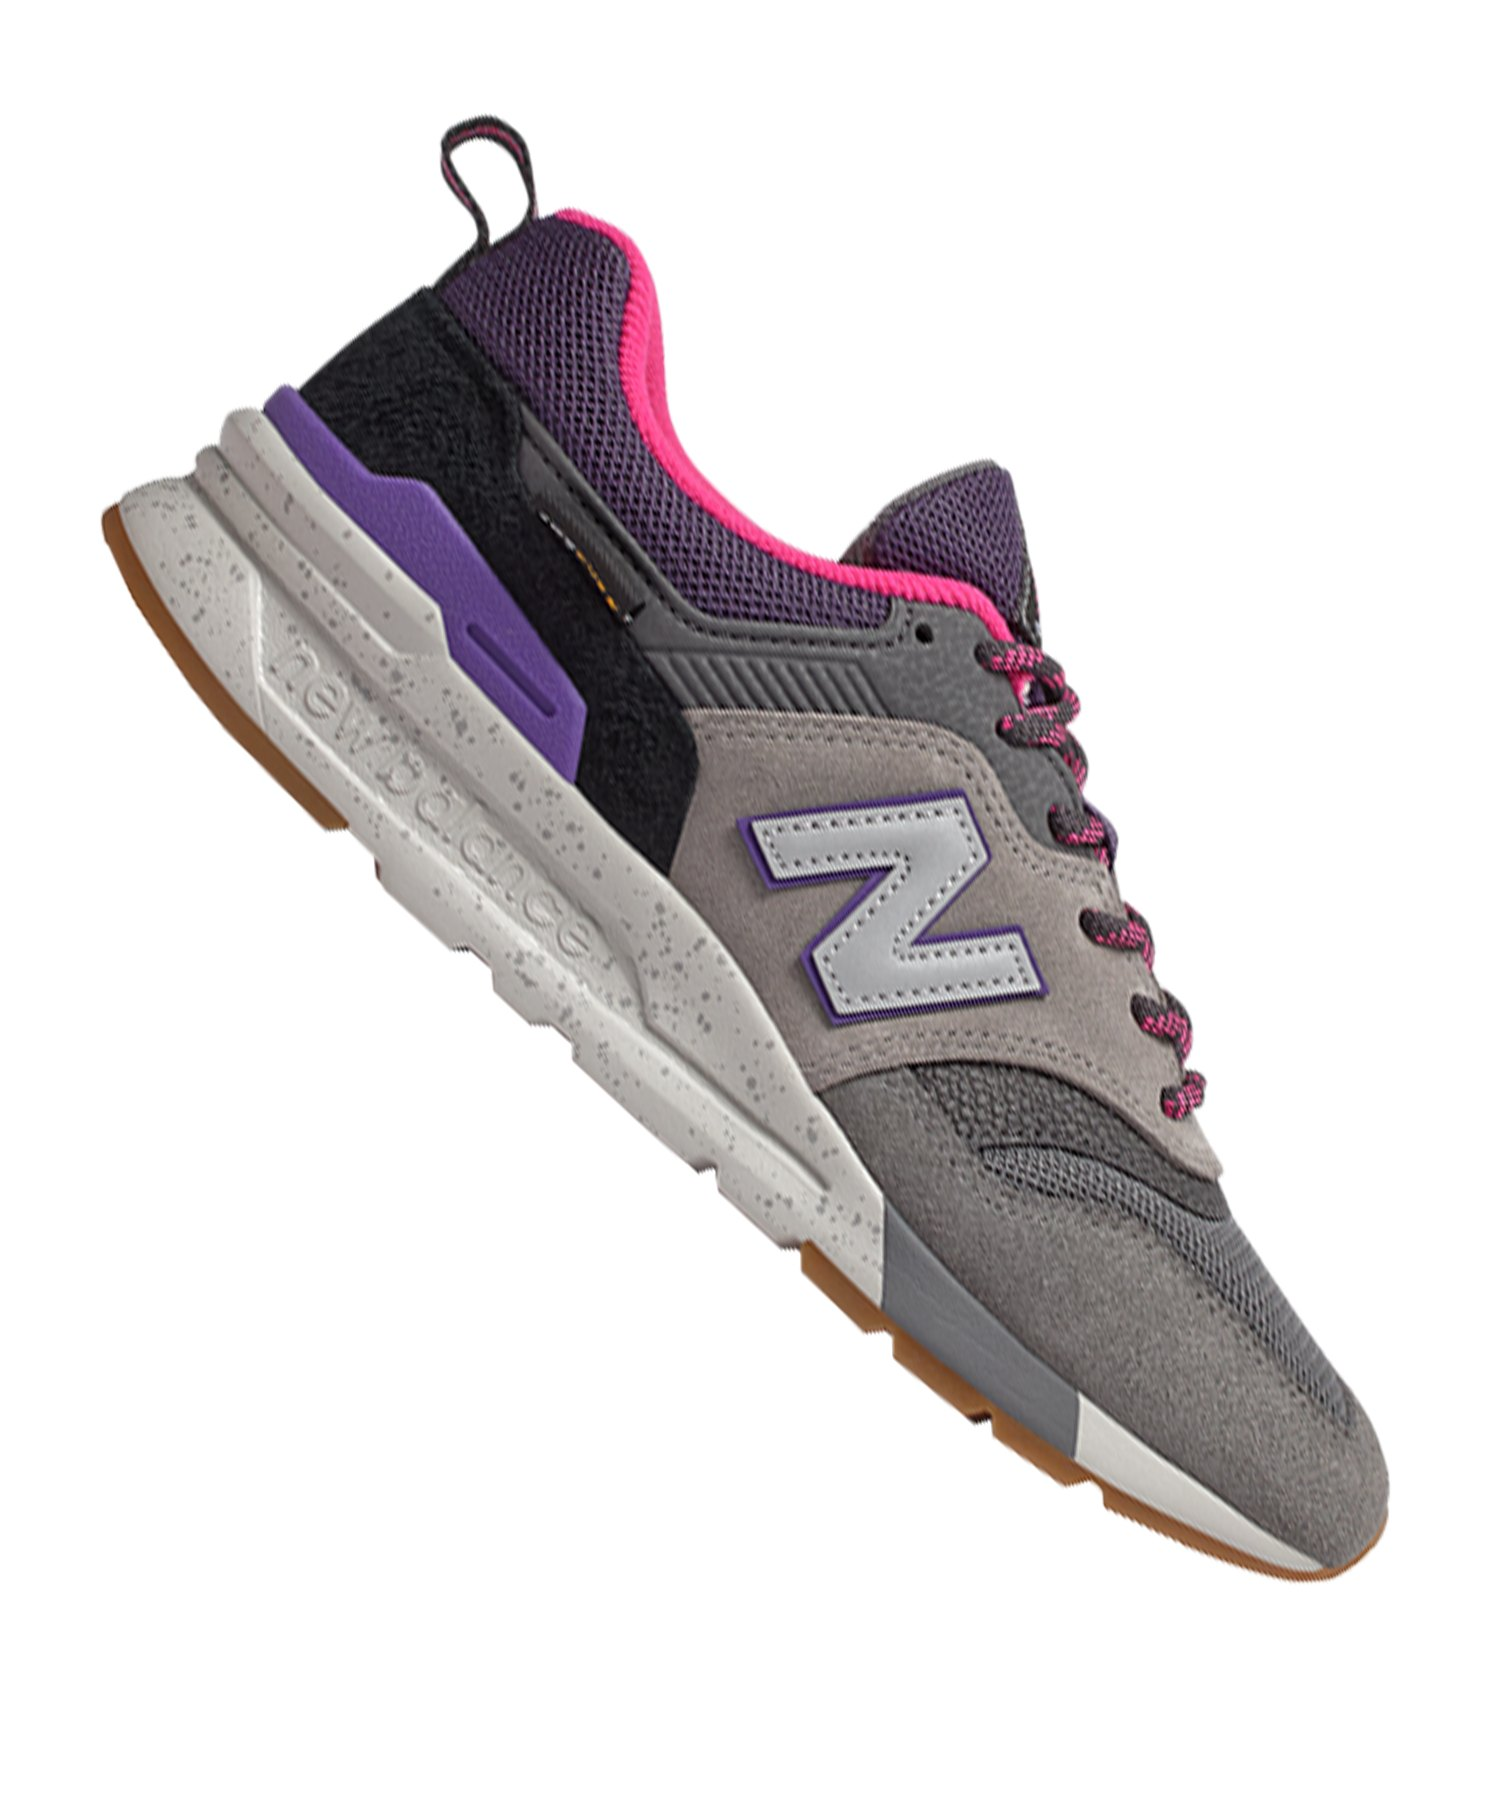 New Balance CW997 B Sneaker Damen Grau F12 - grau